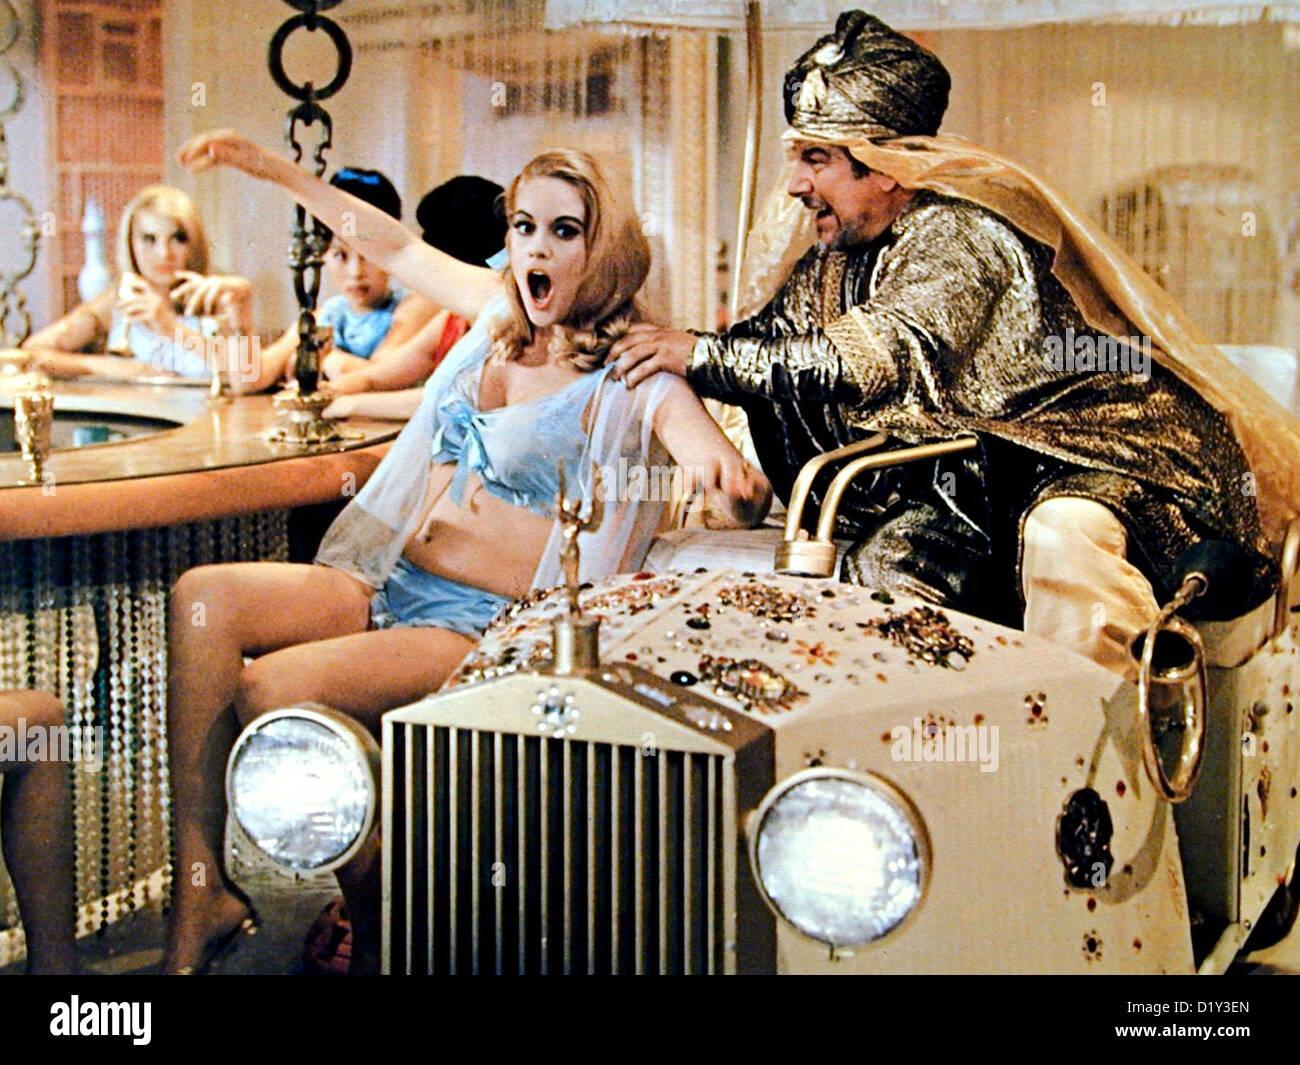 goldfarb stock photos goldfarb stock images alamy eine zuviel im harem john goldfarb please come home barbara bouchet peter ustinov